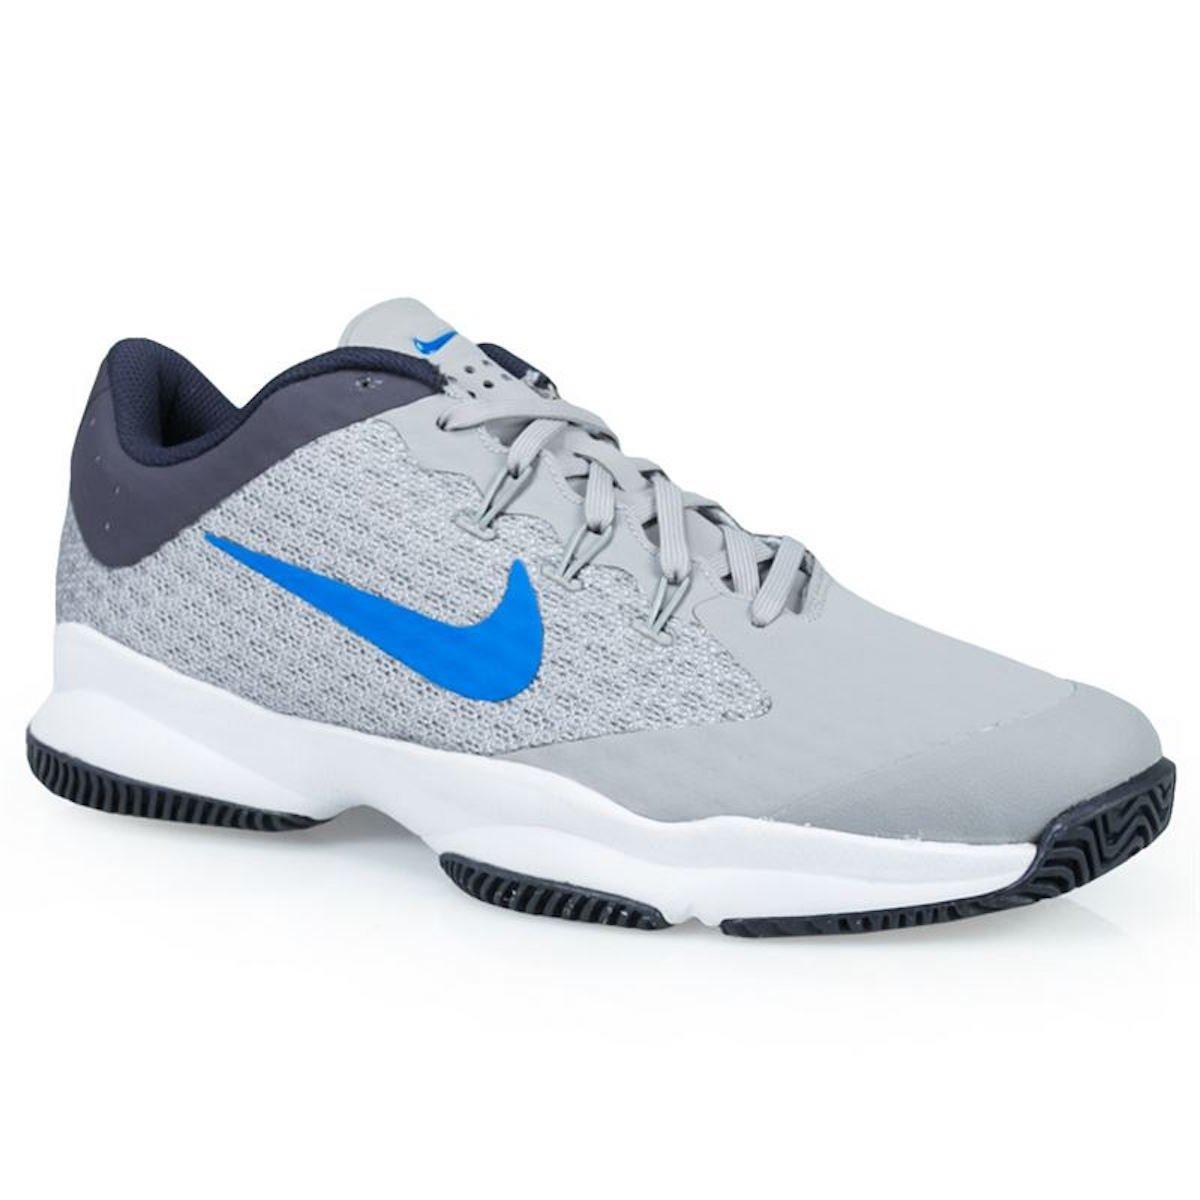 NIKE Men's Air Zoom Ultra Tennis Shoe (10.5 D(M) US, Atmosphere Grey/White/Gridiron/Photo Blue) by NIKE